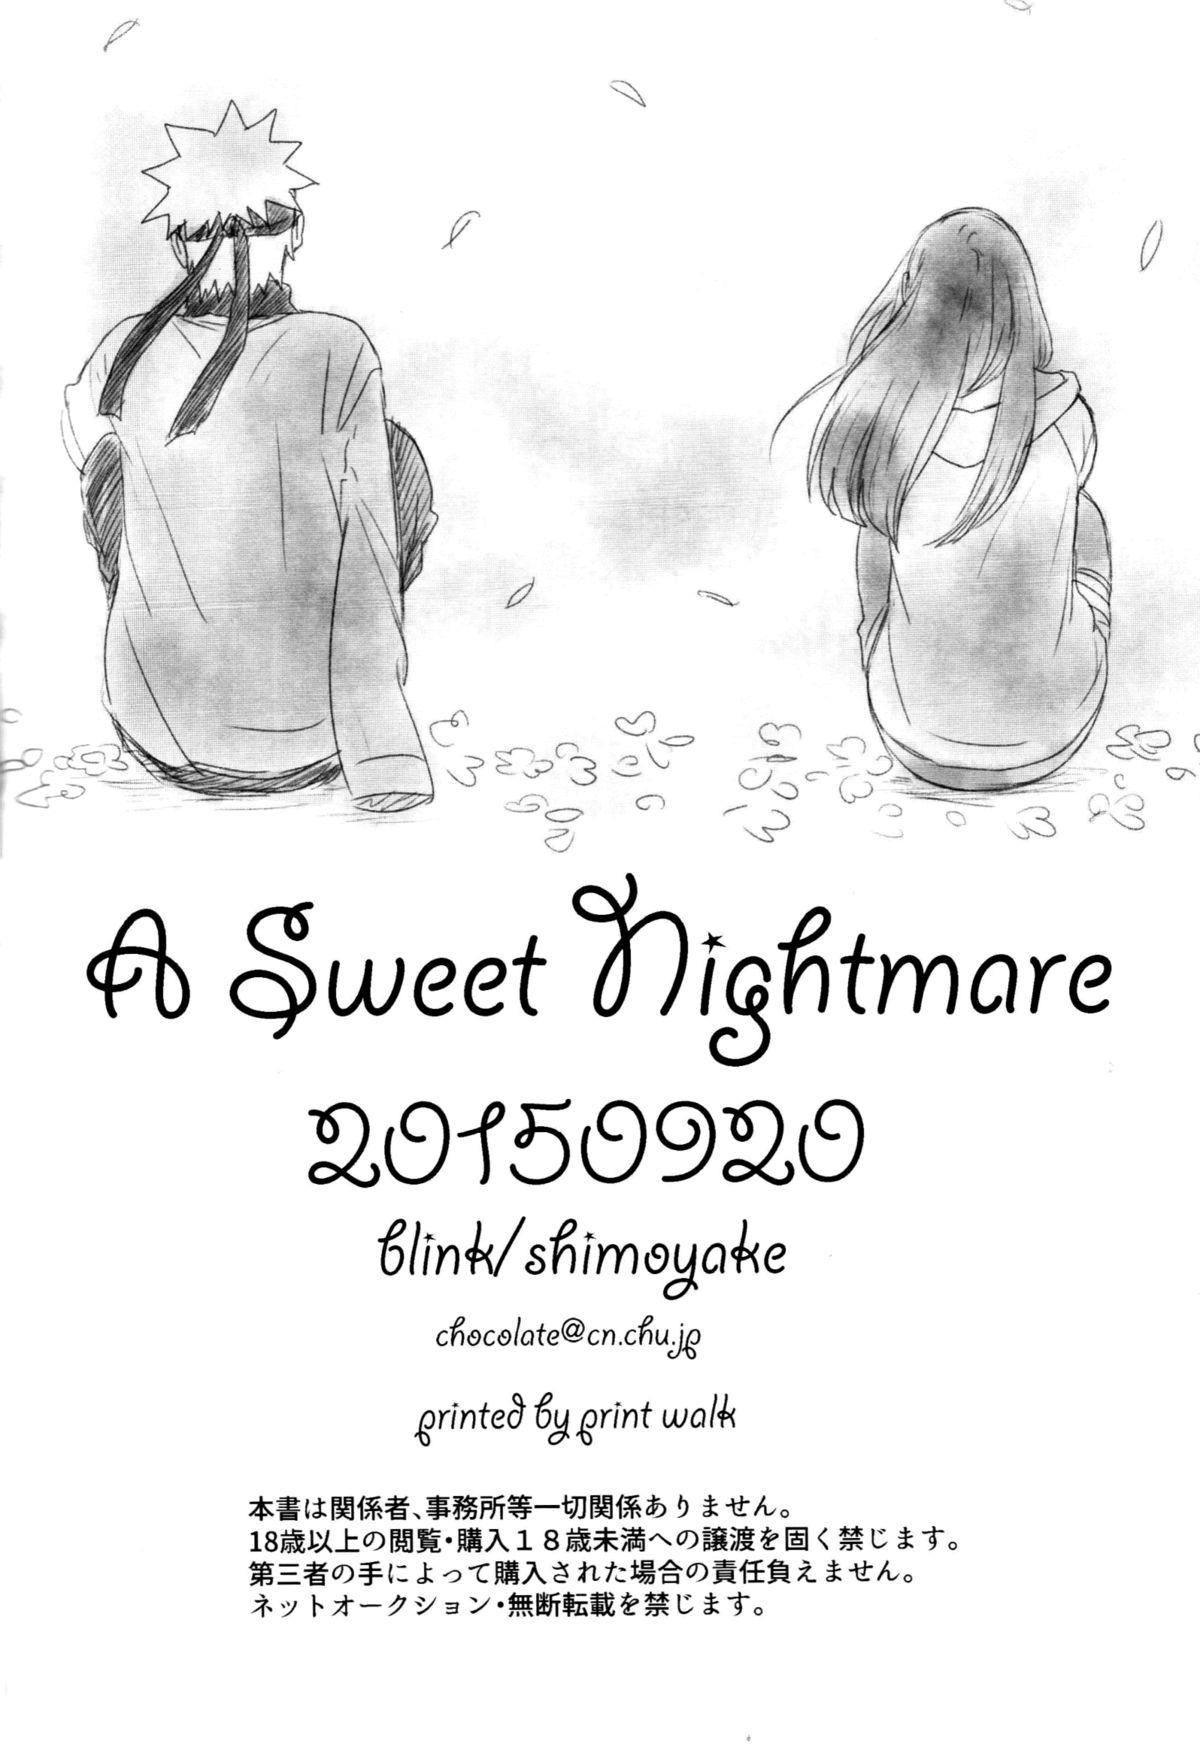 A Sweet Nightmare 90